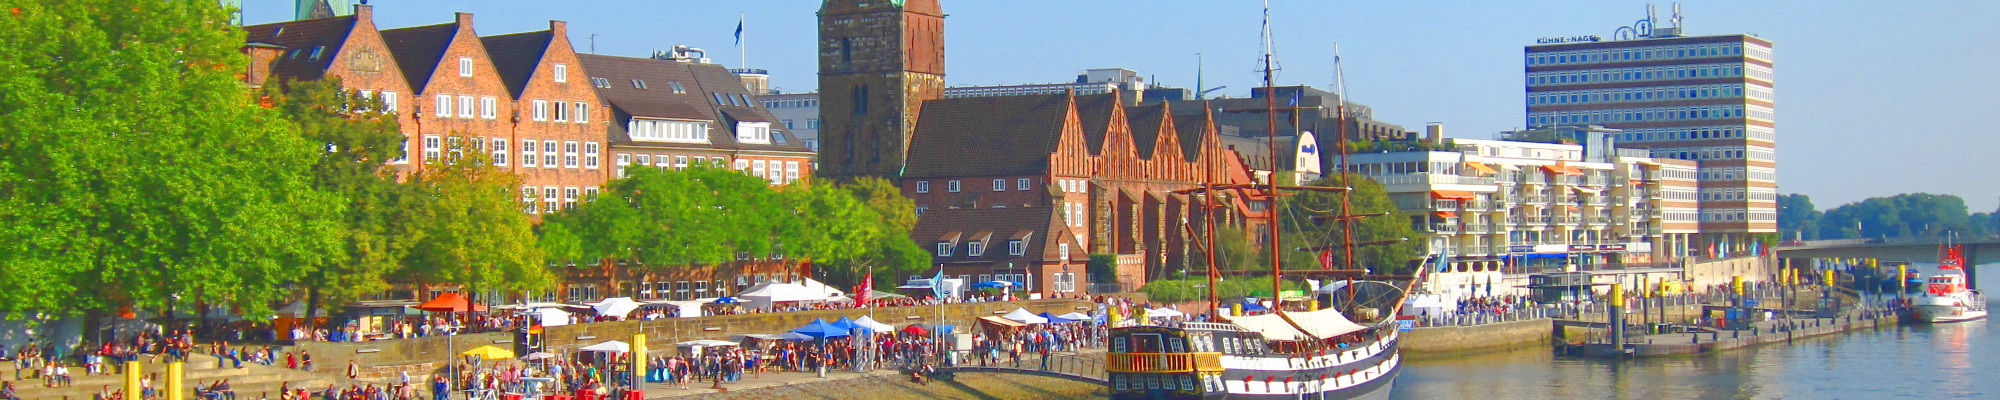 Eventagentur Bremen